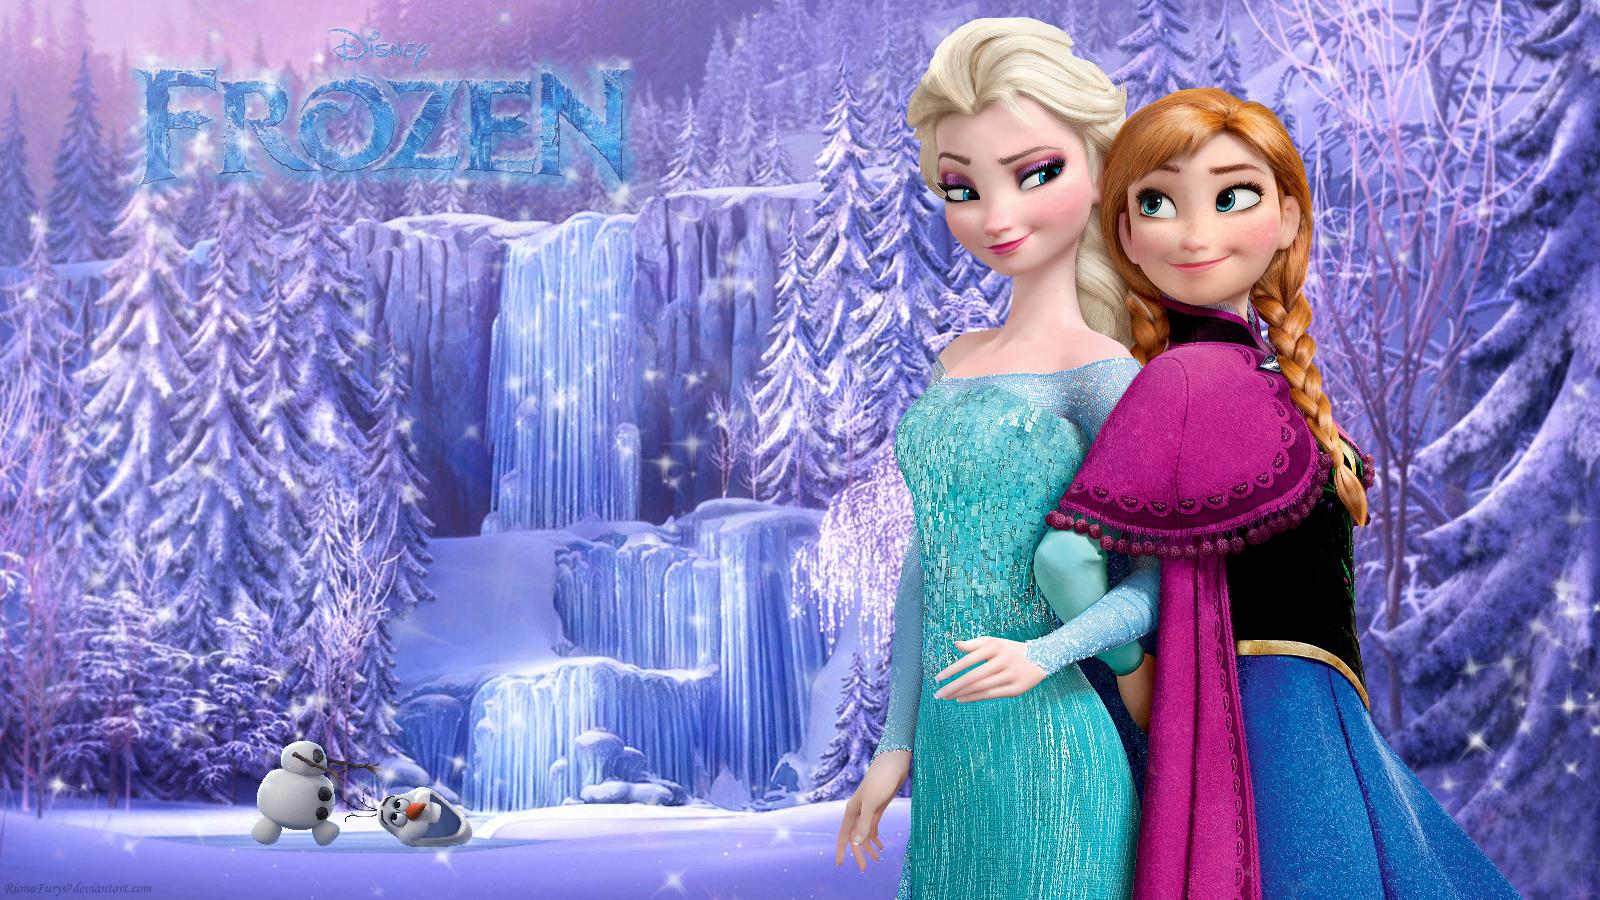 Frozen Wallpaper Disney Wallpapersafari